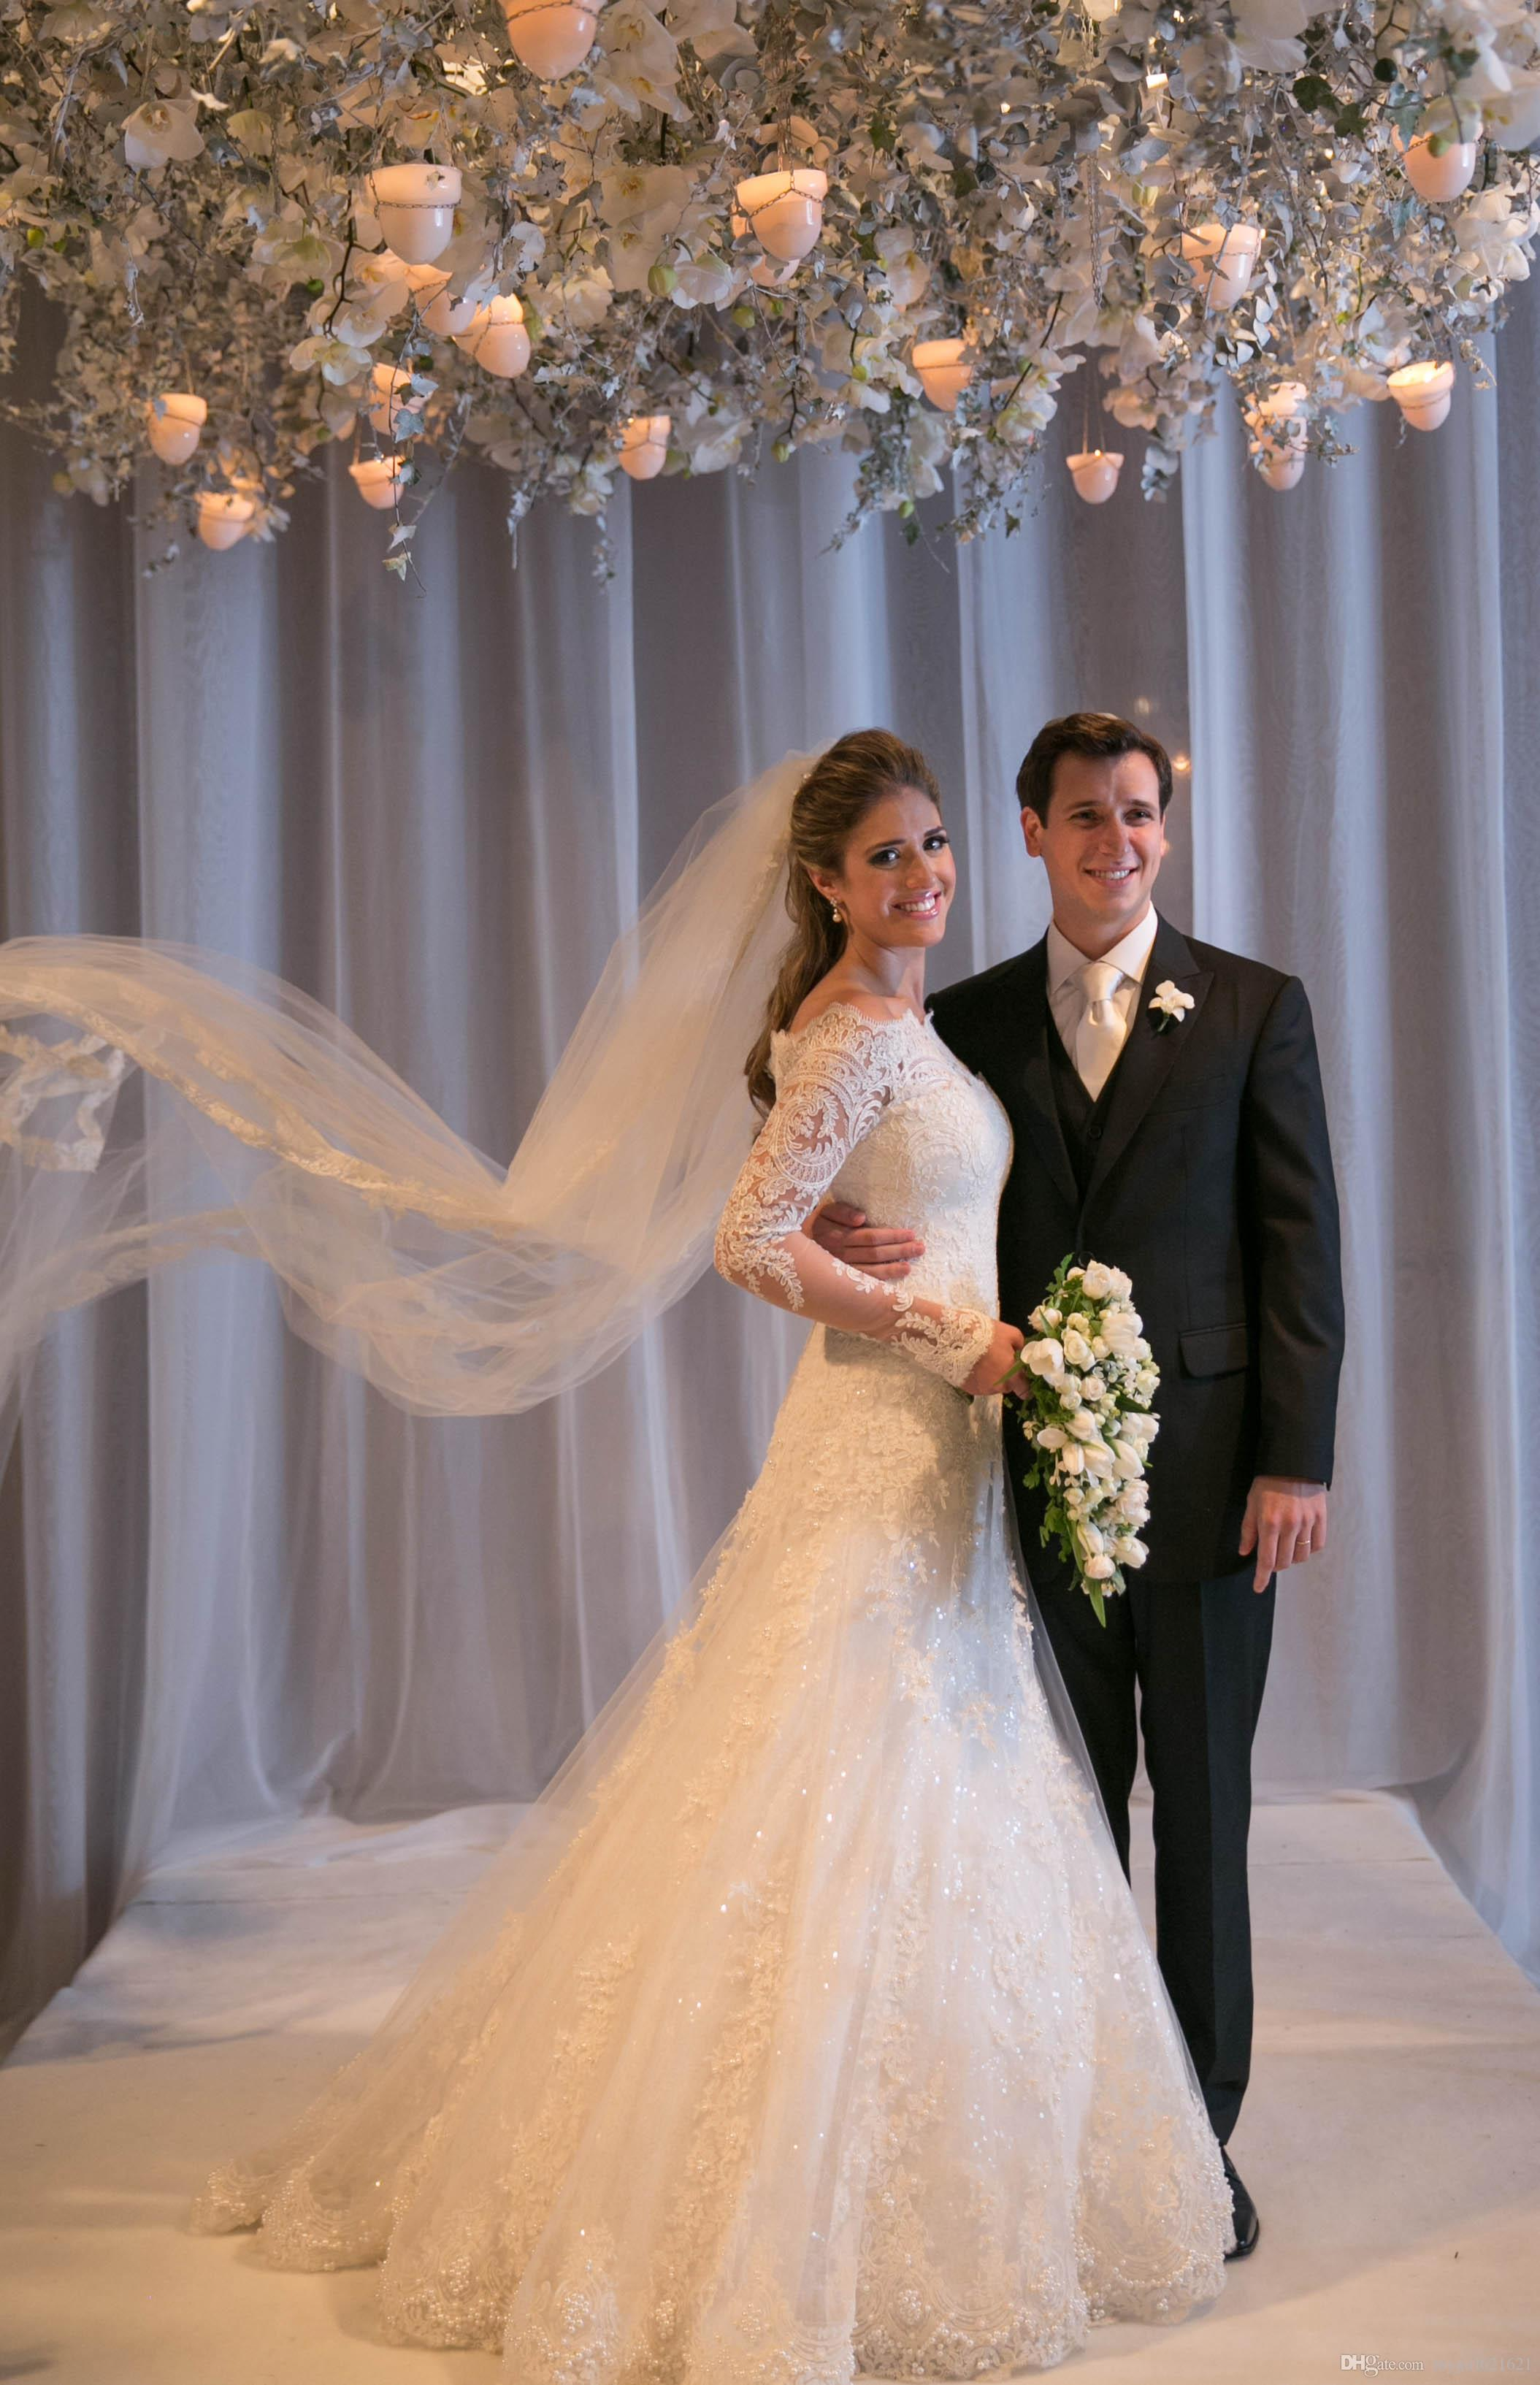 Mermaid Wedding Dresses With Long Veil